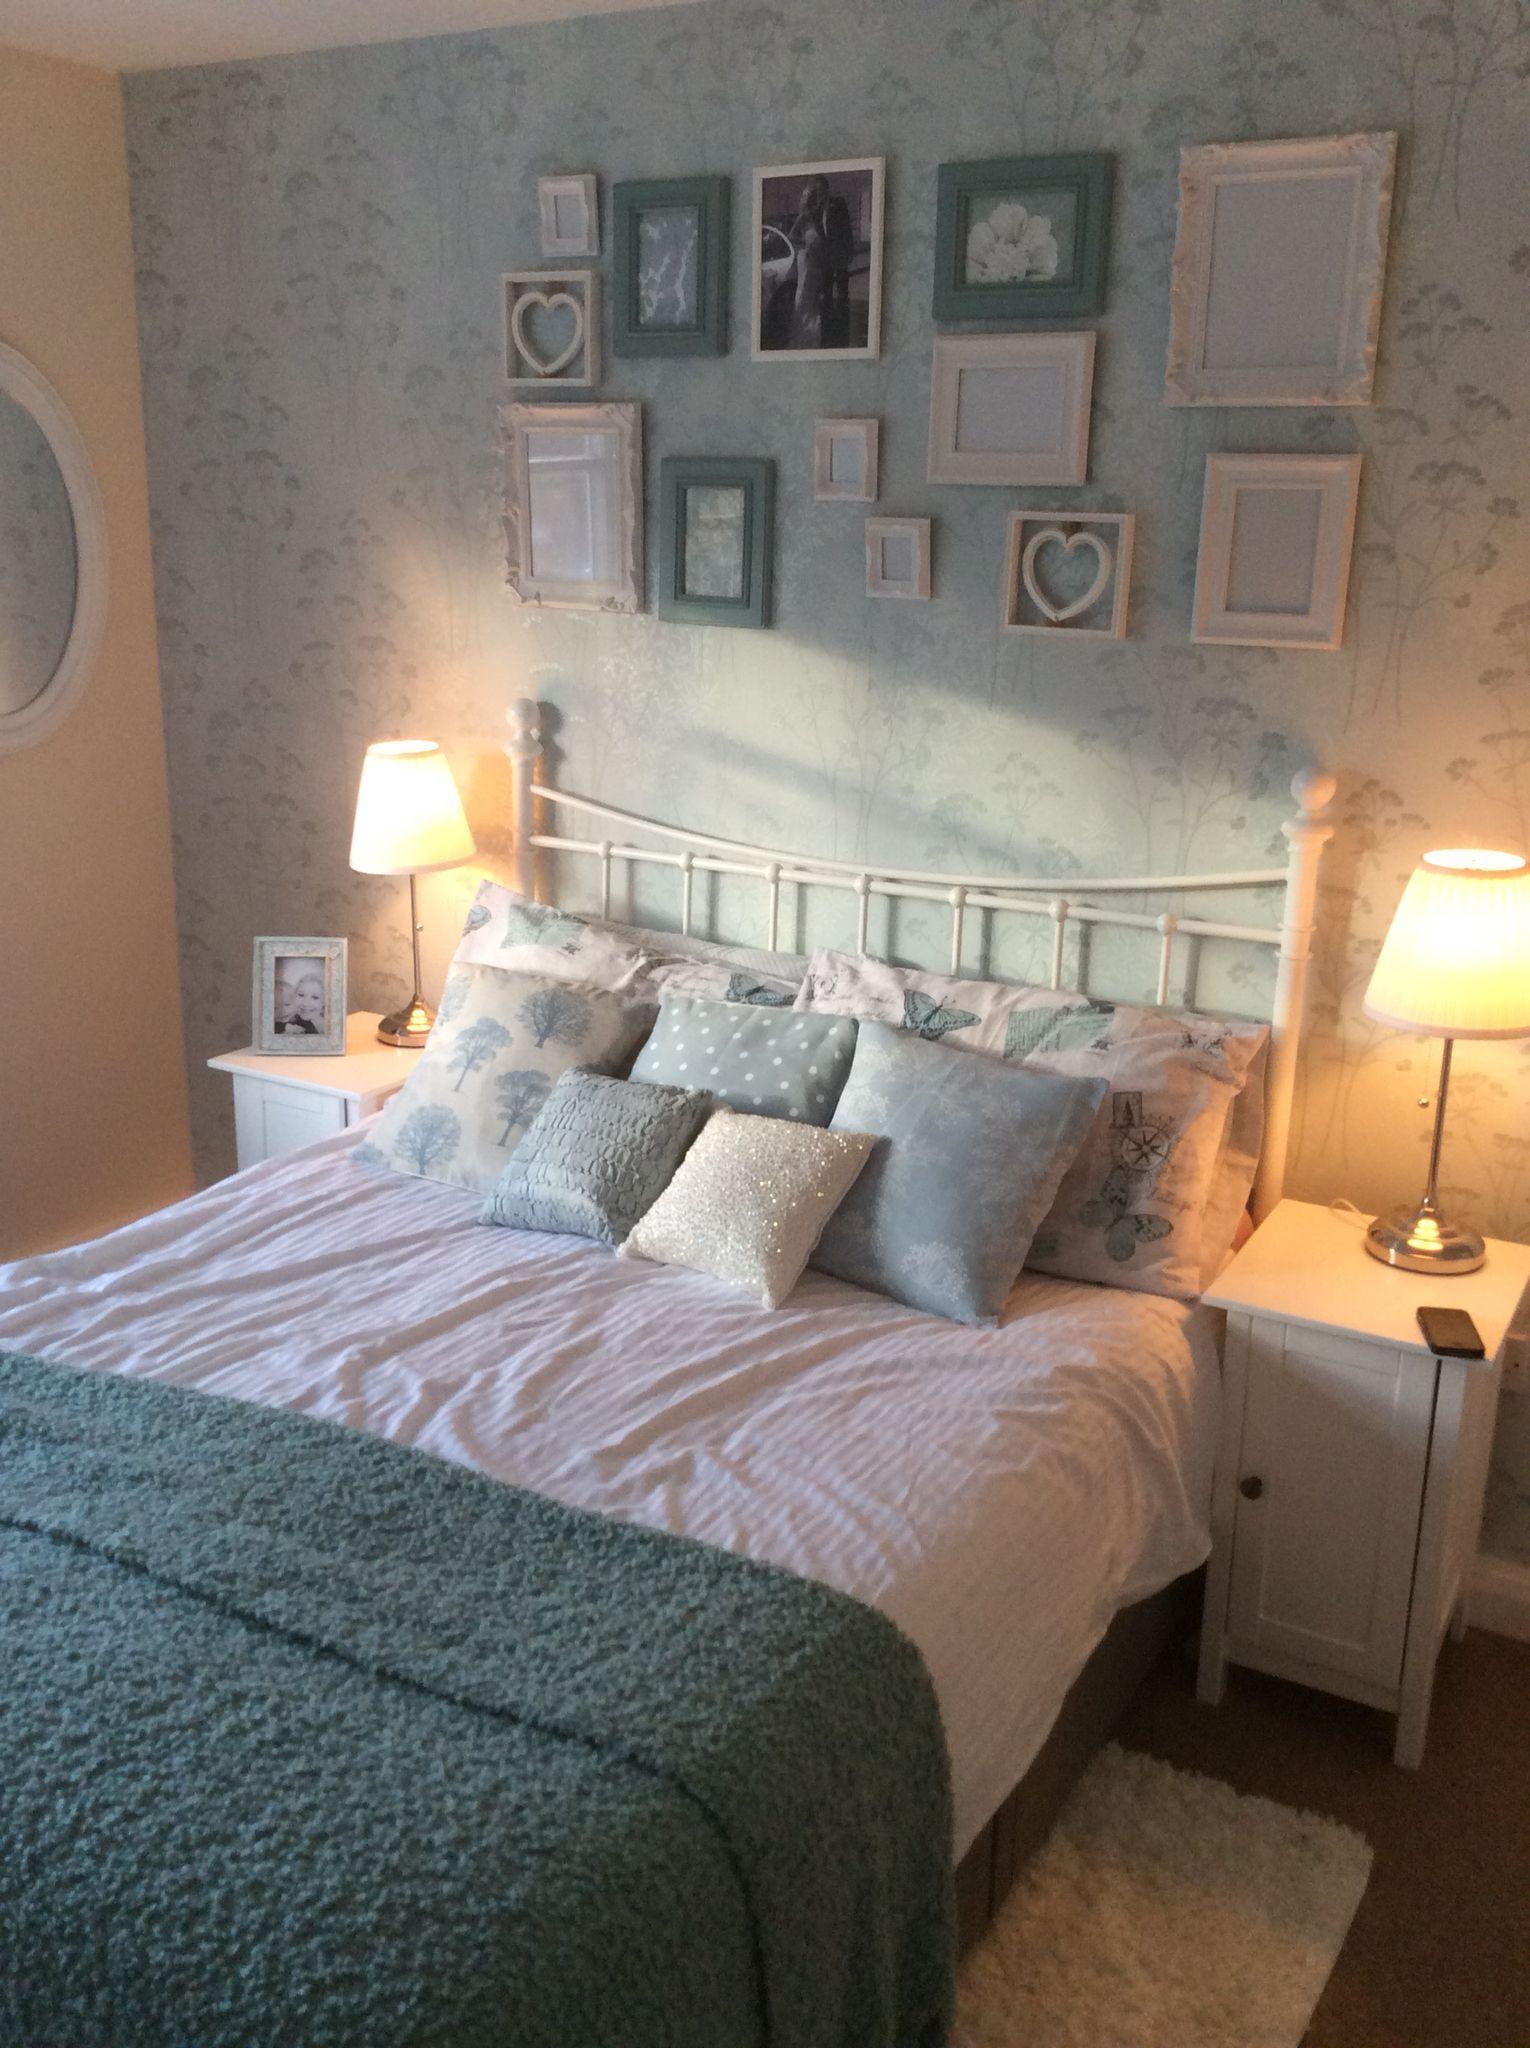 Shabby Chic Duck Egg Bedroom On A Budget #shabbychicbedroomsonabudget